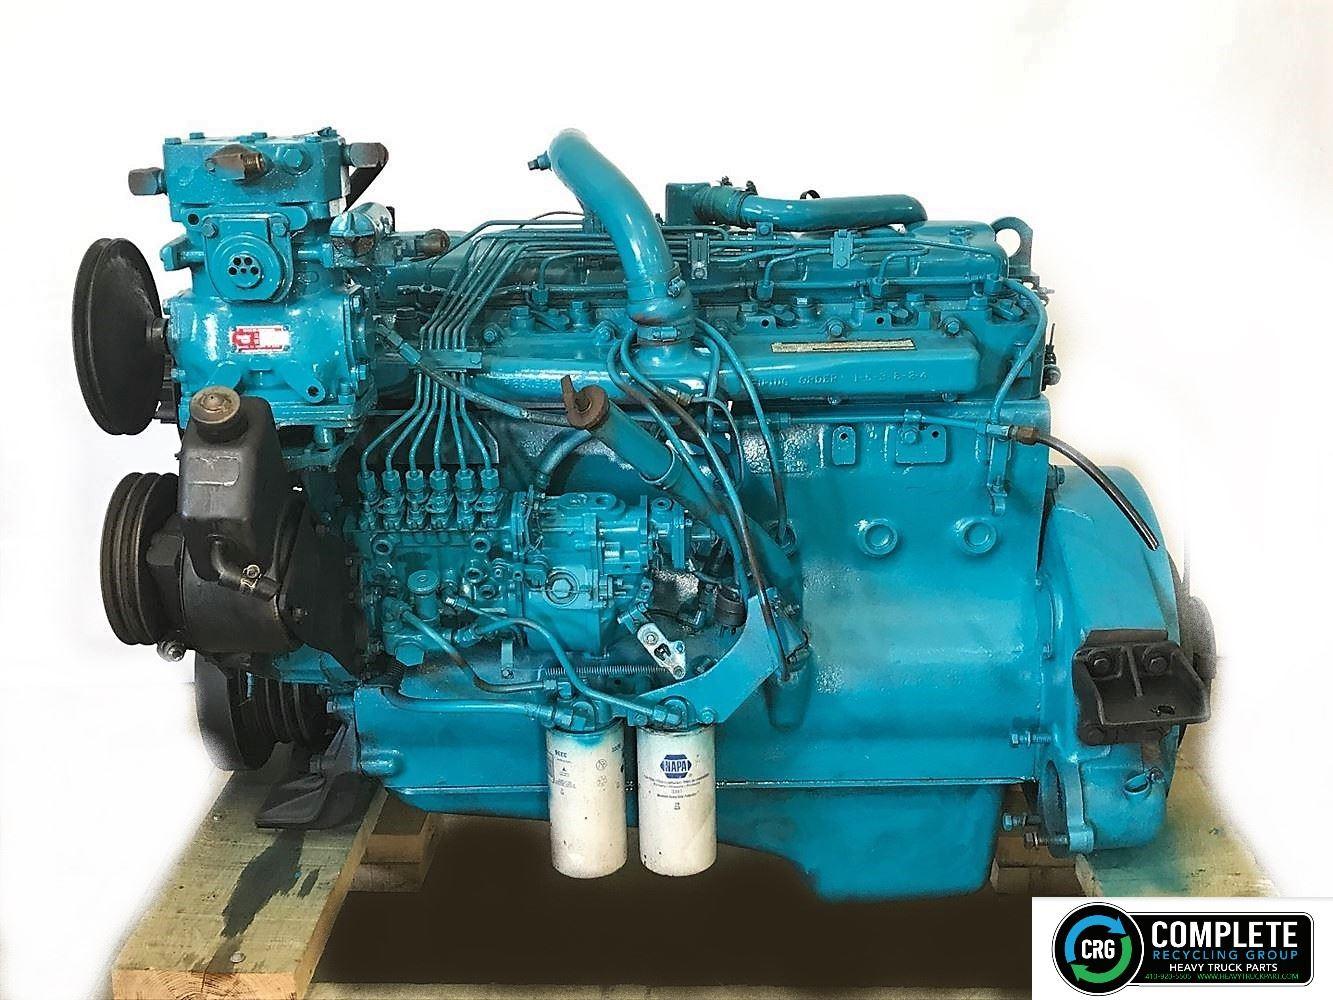 1985 INTERNATIONAL DT466C ENGINE ASSEMBLY TRUCK PARTS #697606